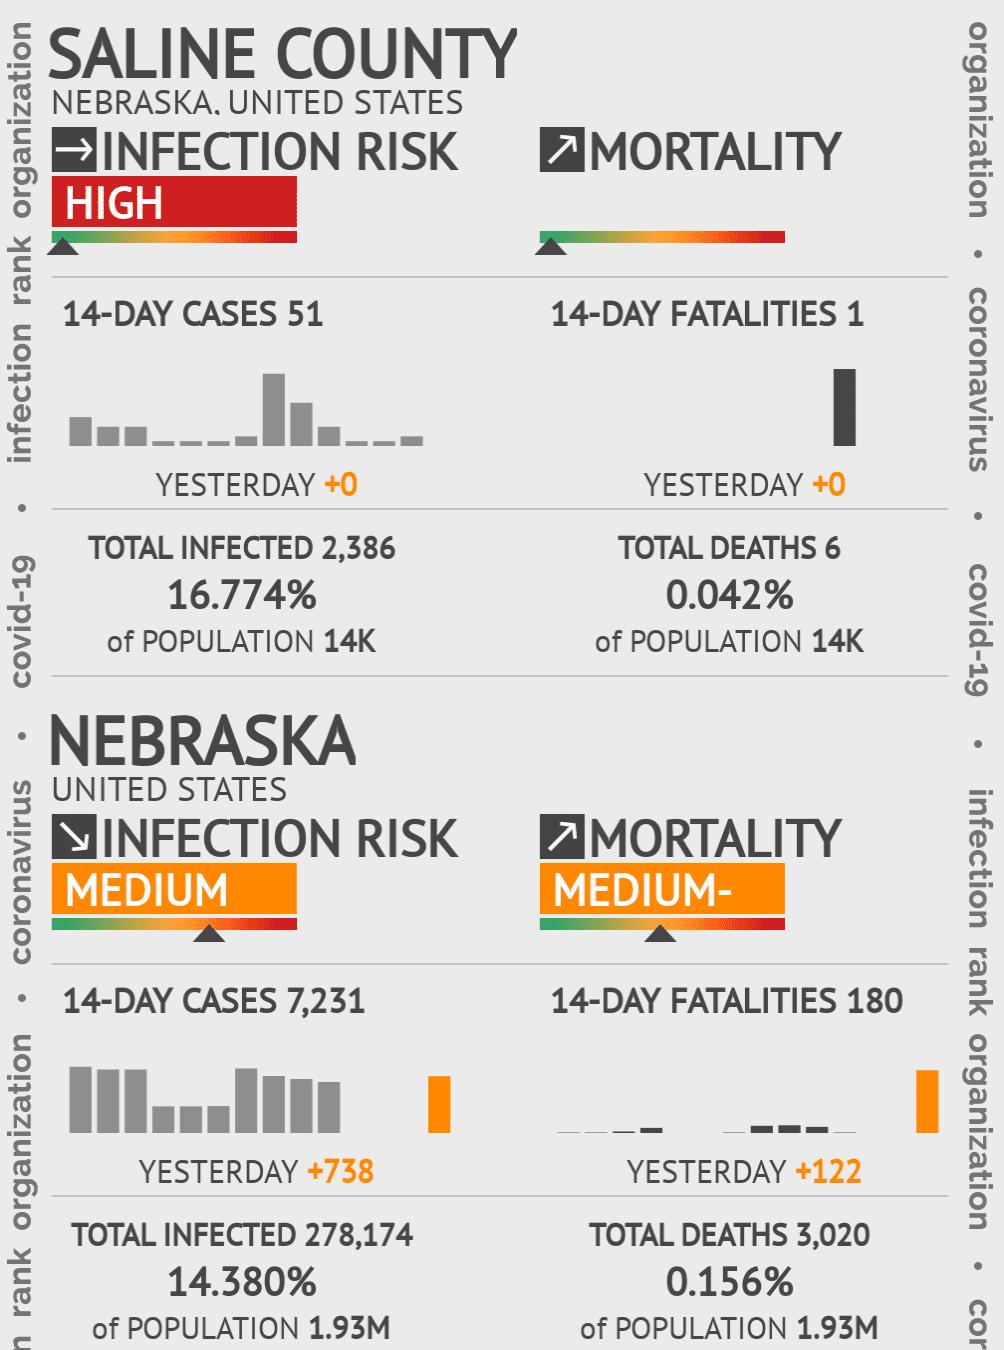 Saline County Coronavirus Covid-19 Risk of Infection on February 28, 2021